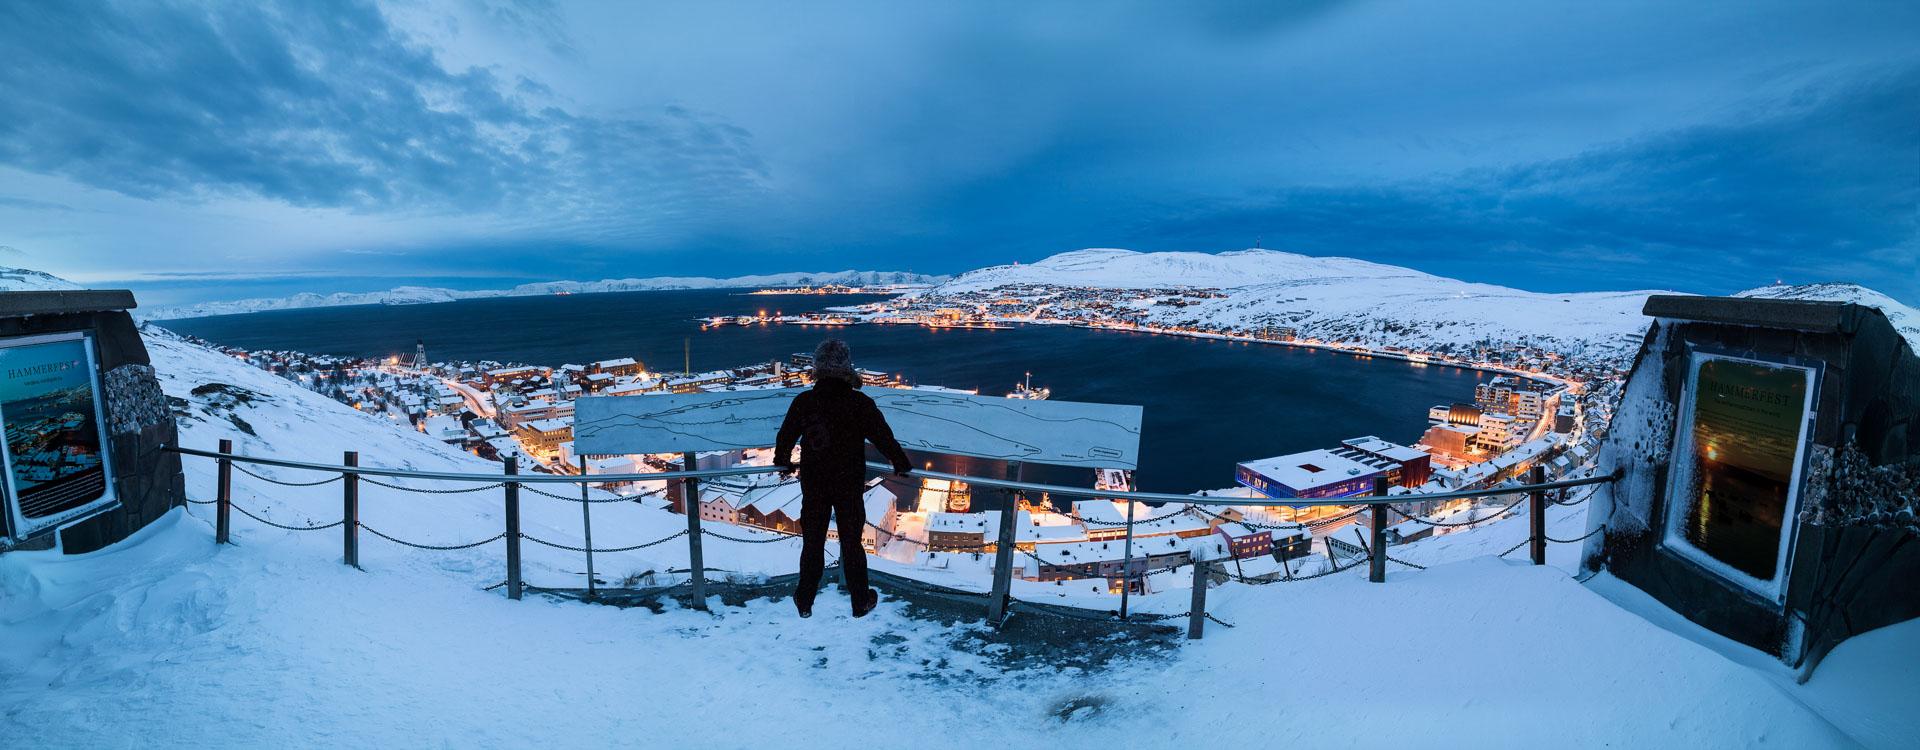 The city mountain in winter dusk © Ziggi Wantuch/Hammerfest Turist